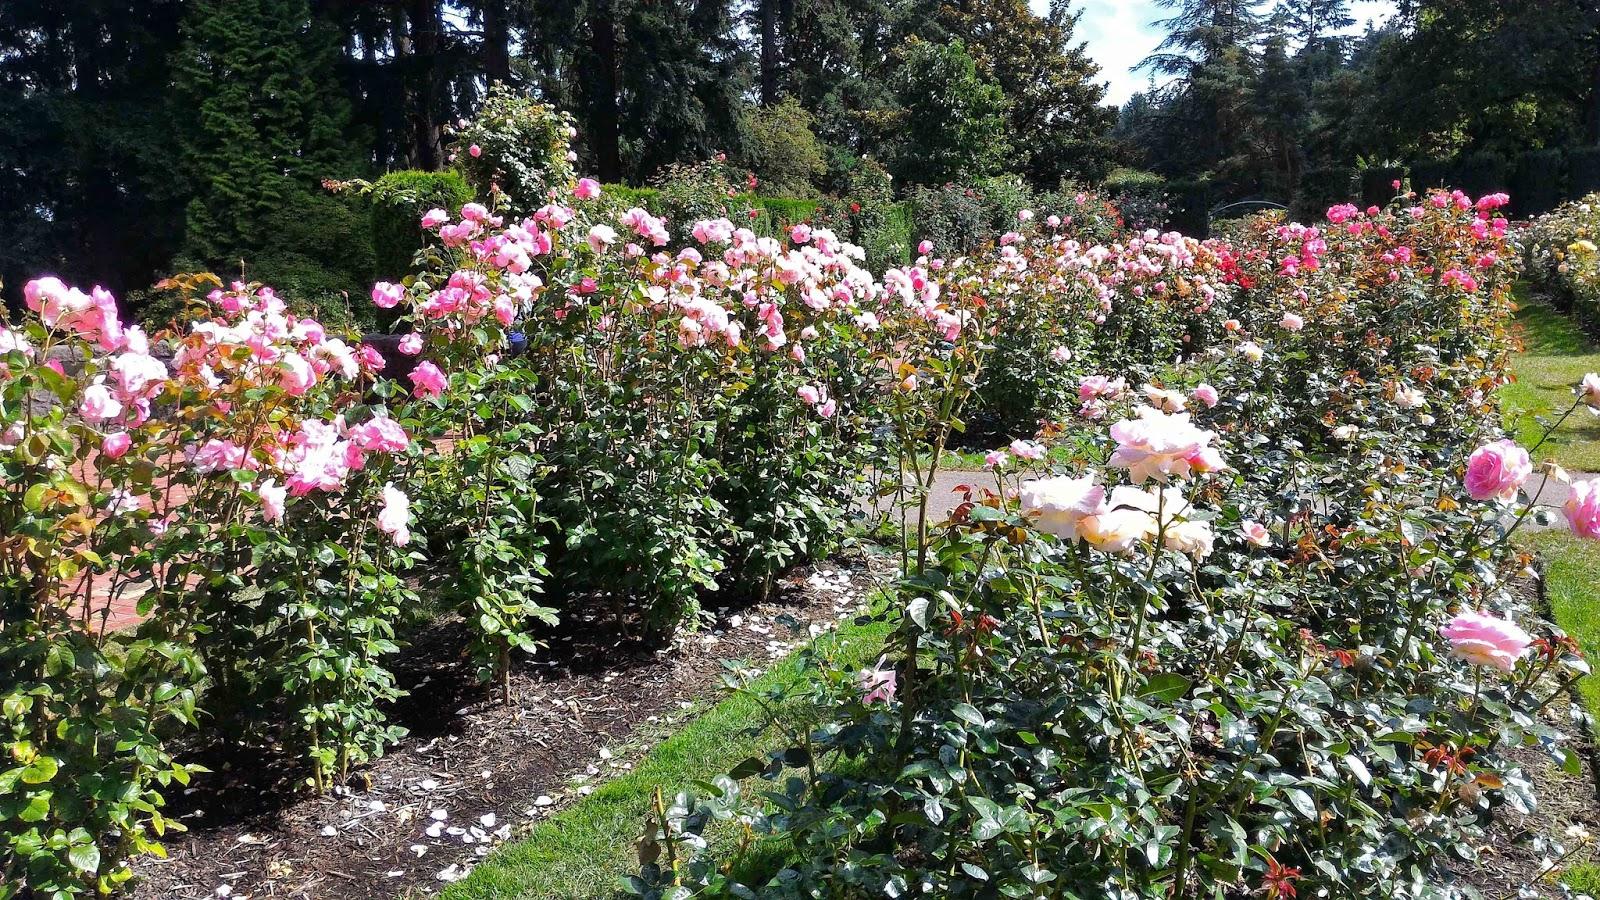 Portland international test rose garden august 2016 - International rose test garden portland ...